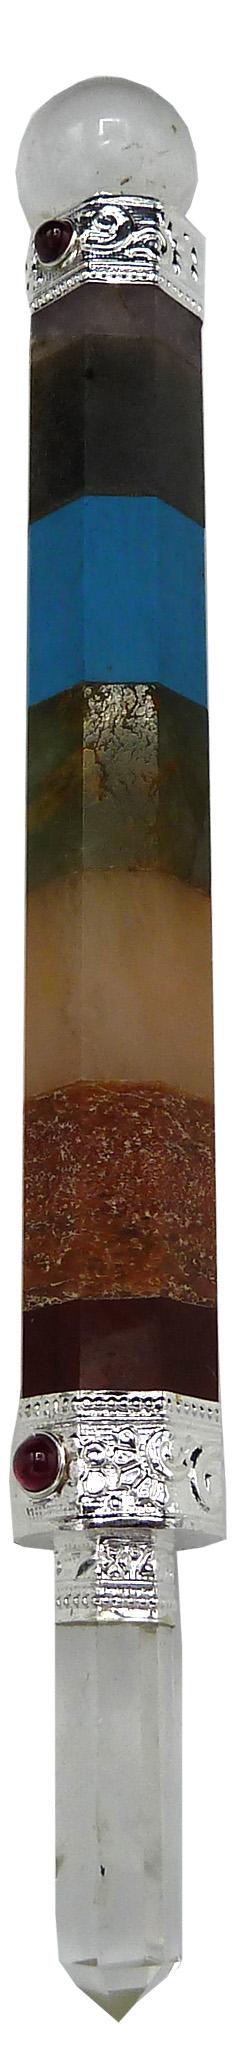 Bâton de soin 7 chakras 15cm